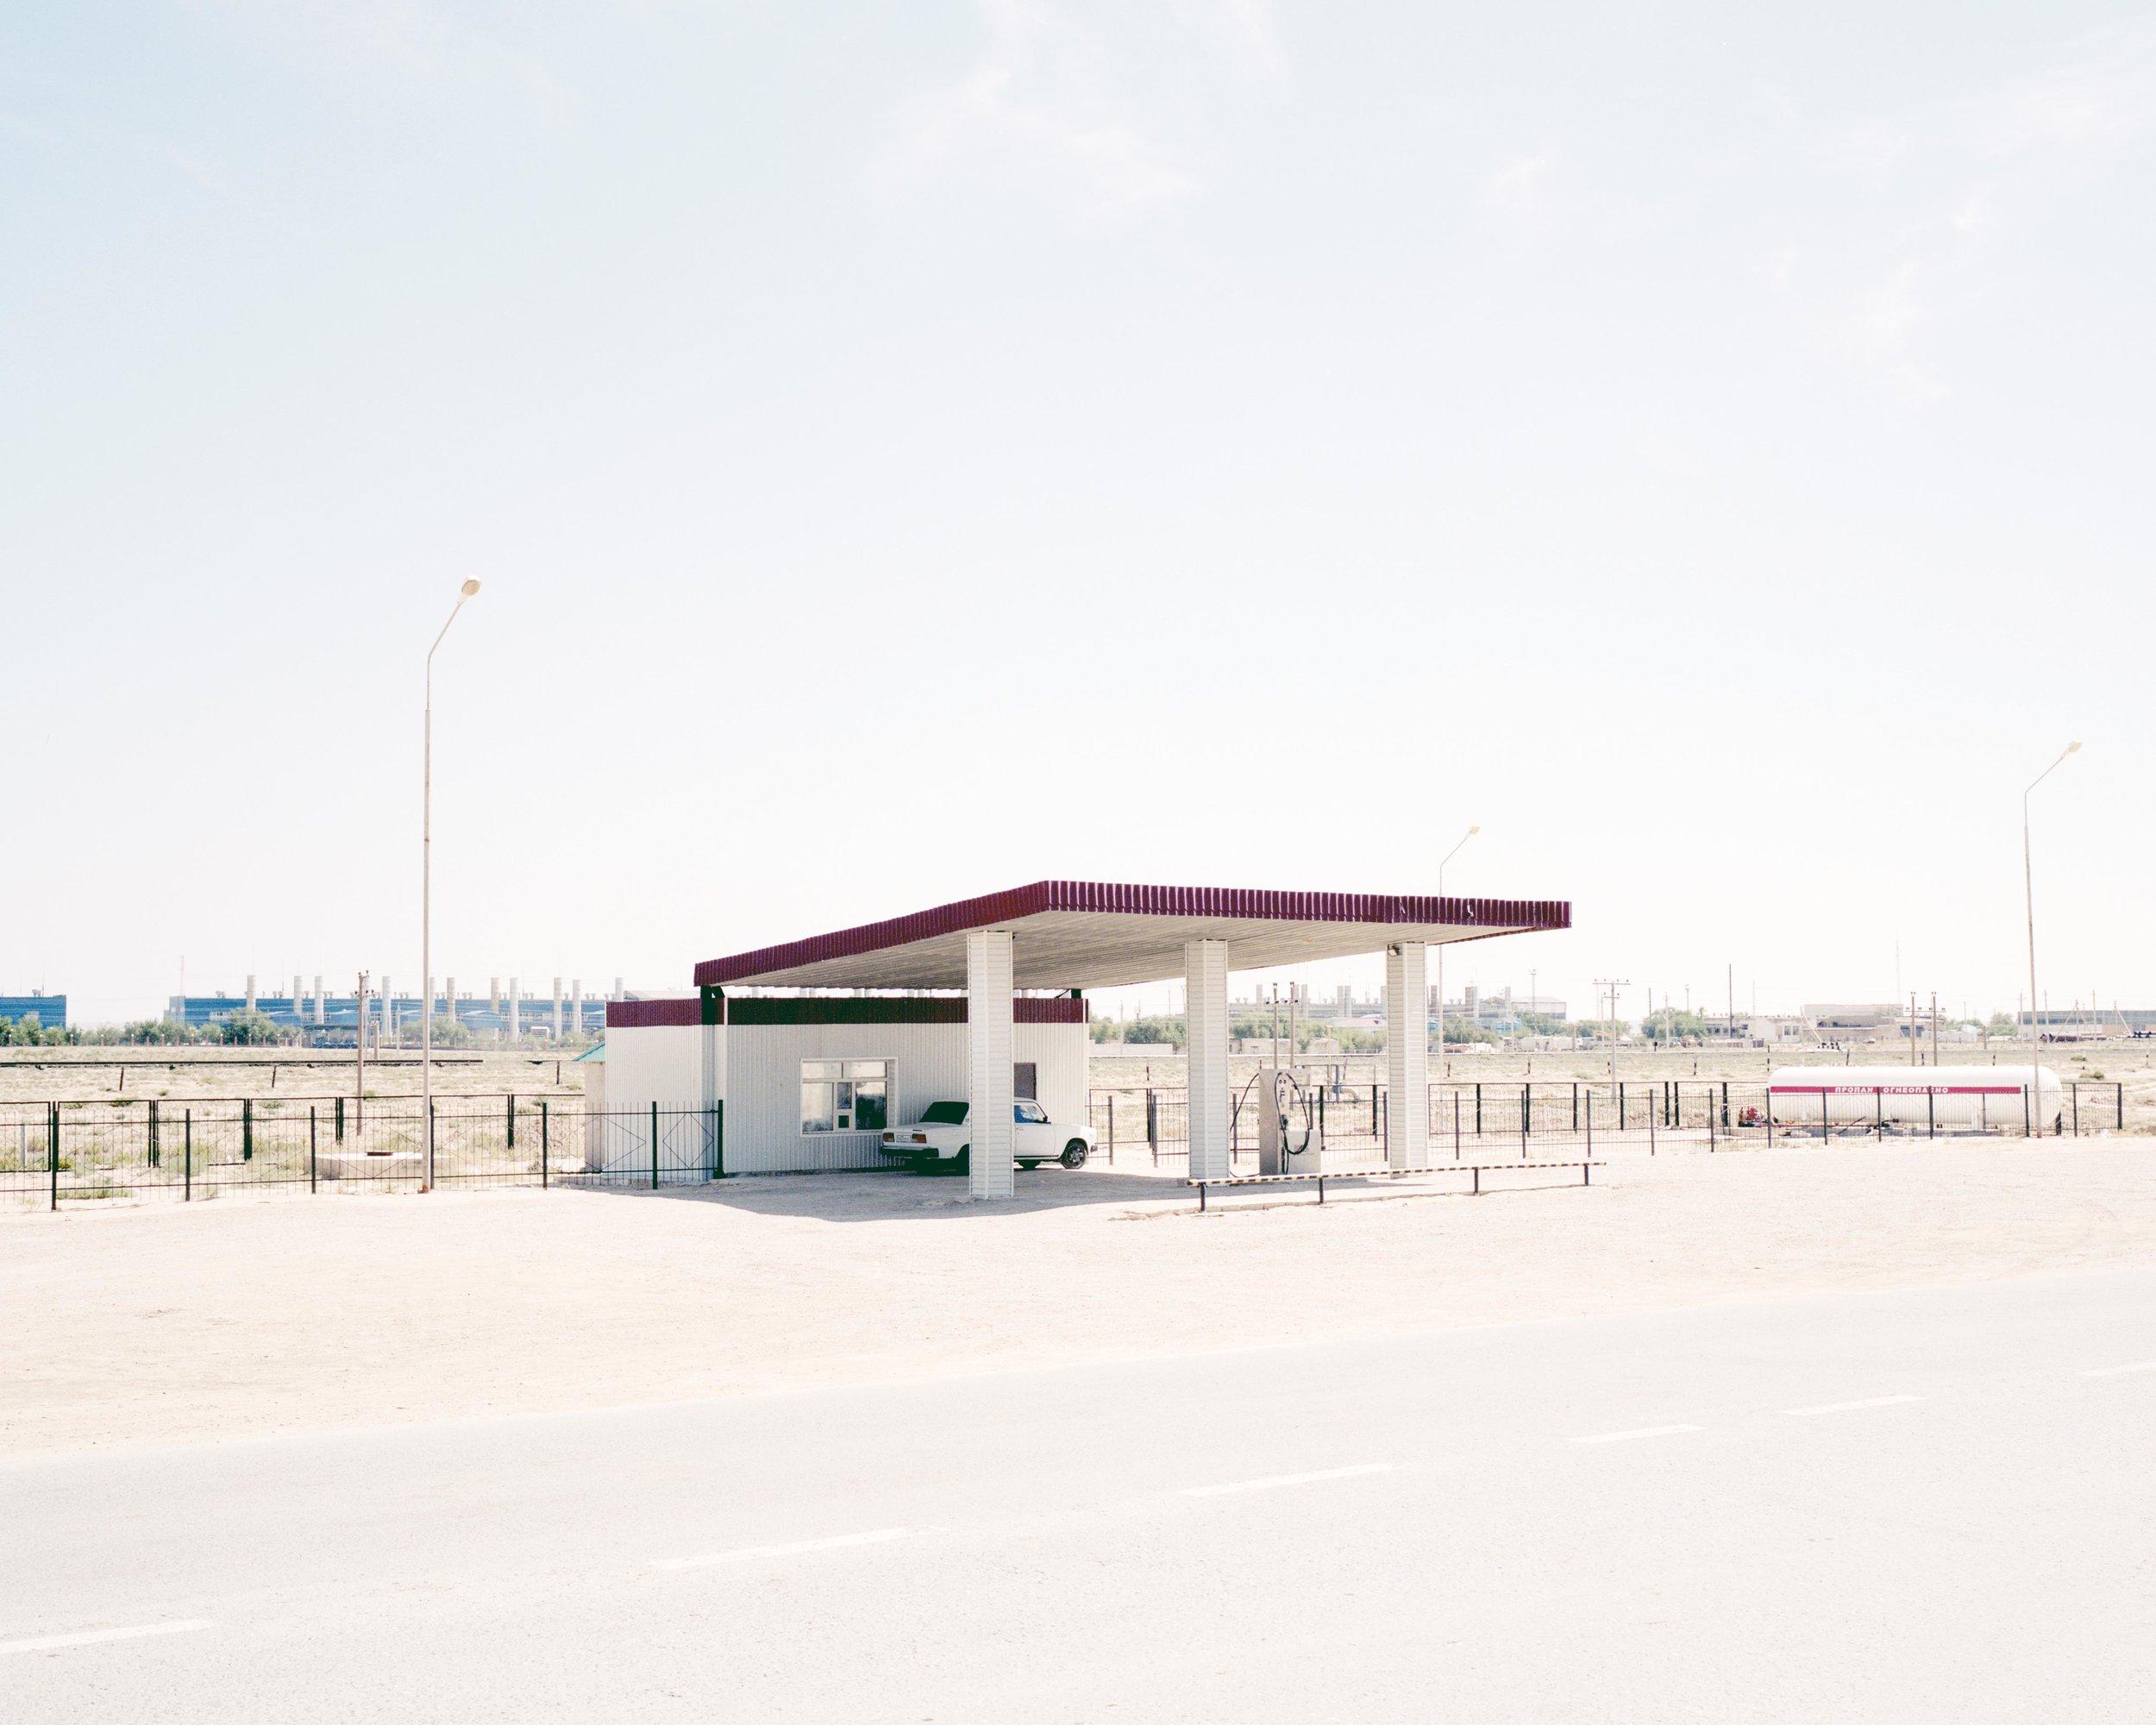 BBB_Petrol_Station.jpg